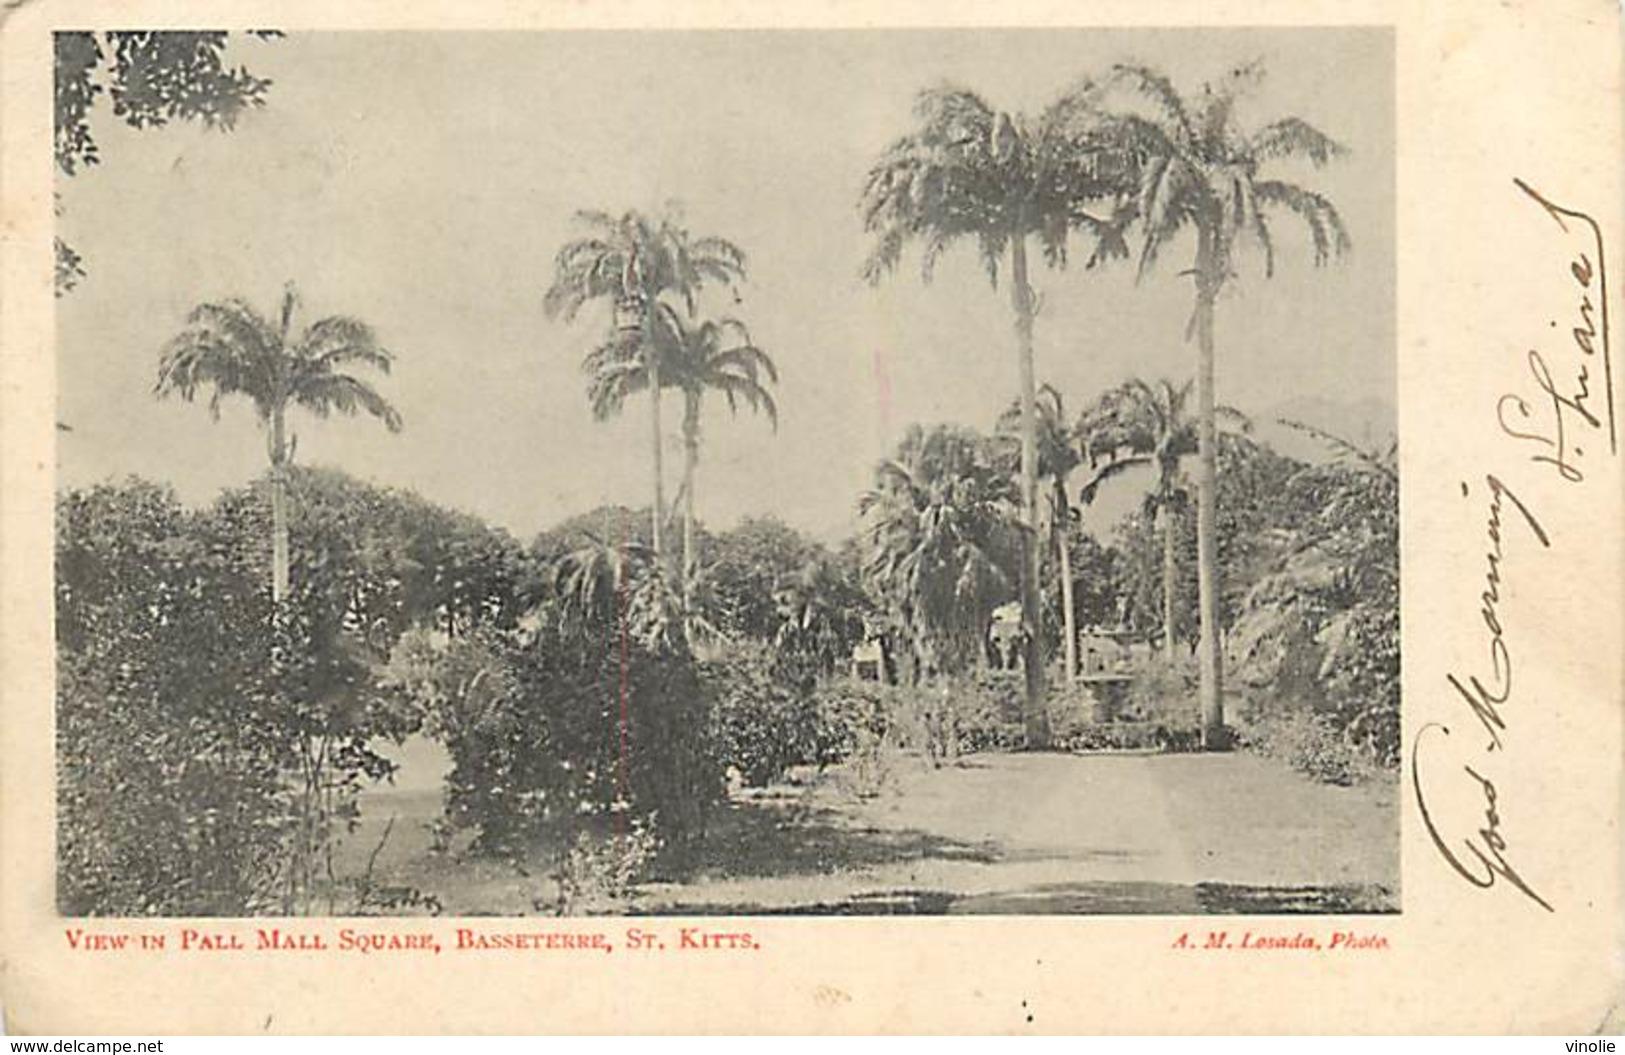 A-17-1276 : LEEWARDS ISLAND  VIEW IN PALL MALL SQUARE BASSETERRE SAINT KITTS - Antilles Neérlandaises